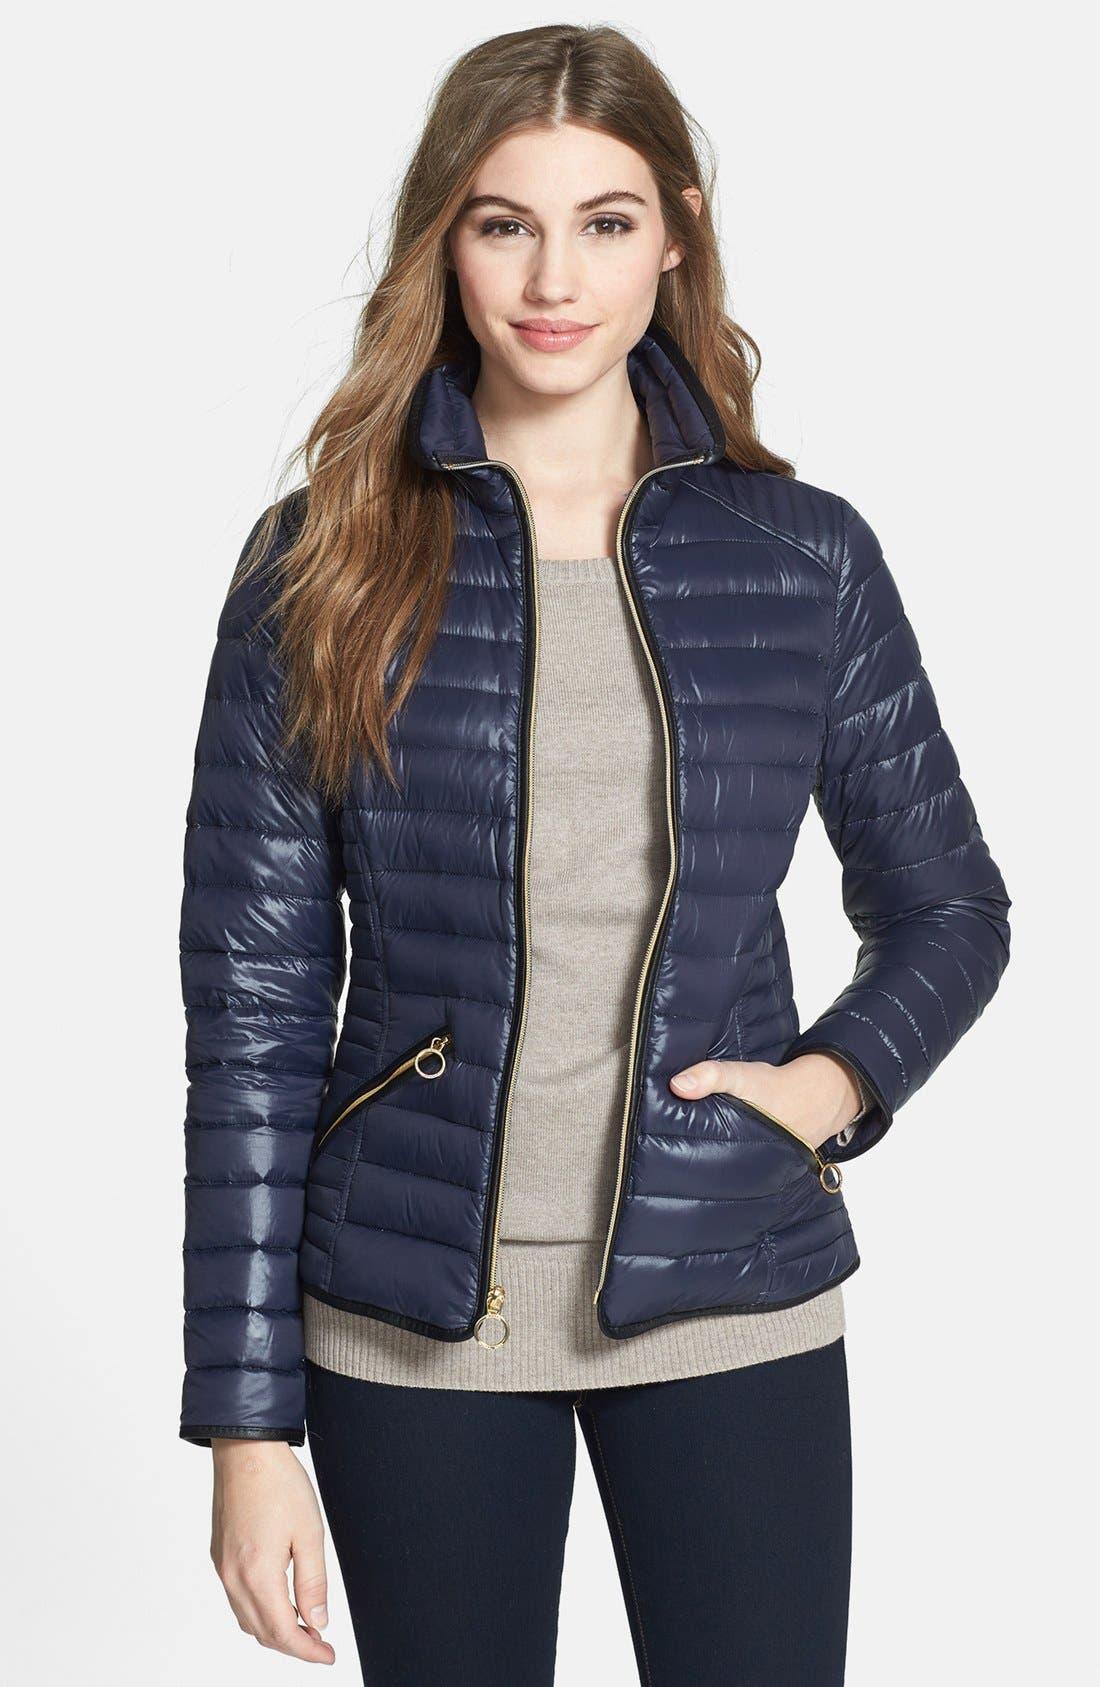 Alternate Image 1 Selected - MICHAEL Michael Kors Faux Leather Trim Down Jacket